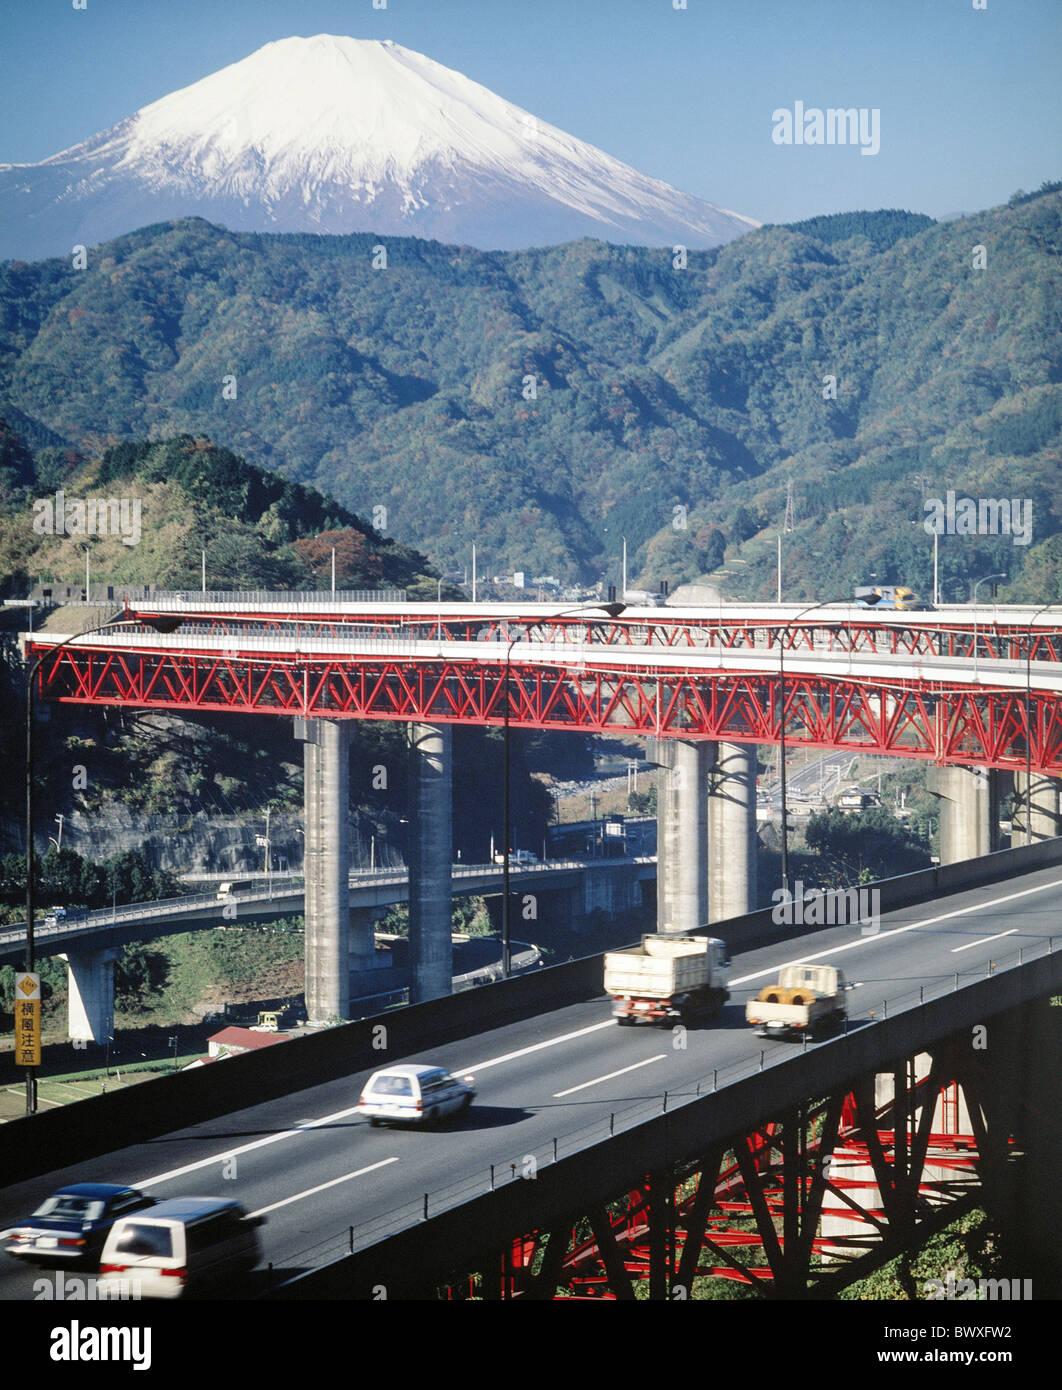 highway bridge Fujijama Fujisan Japan Asia snow Tomei traffic - Stock Image